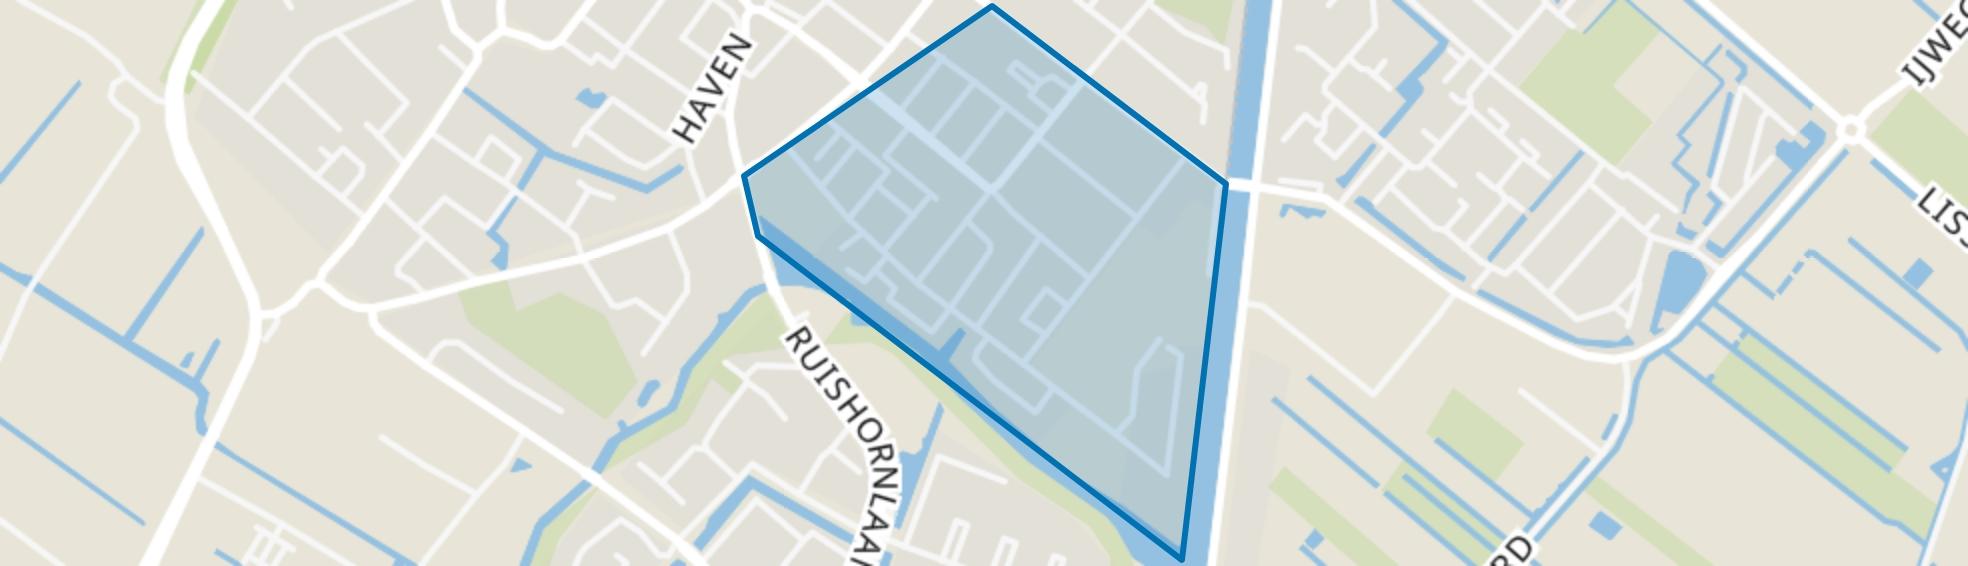 Bloemenbuurt, Lisse map